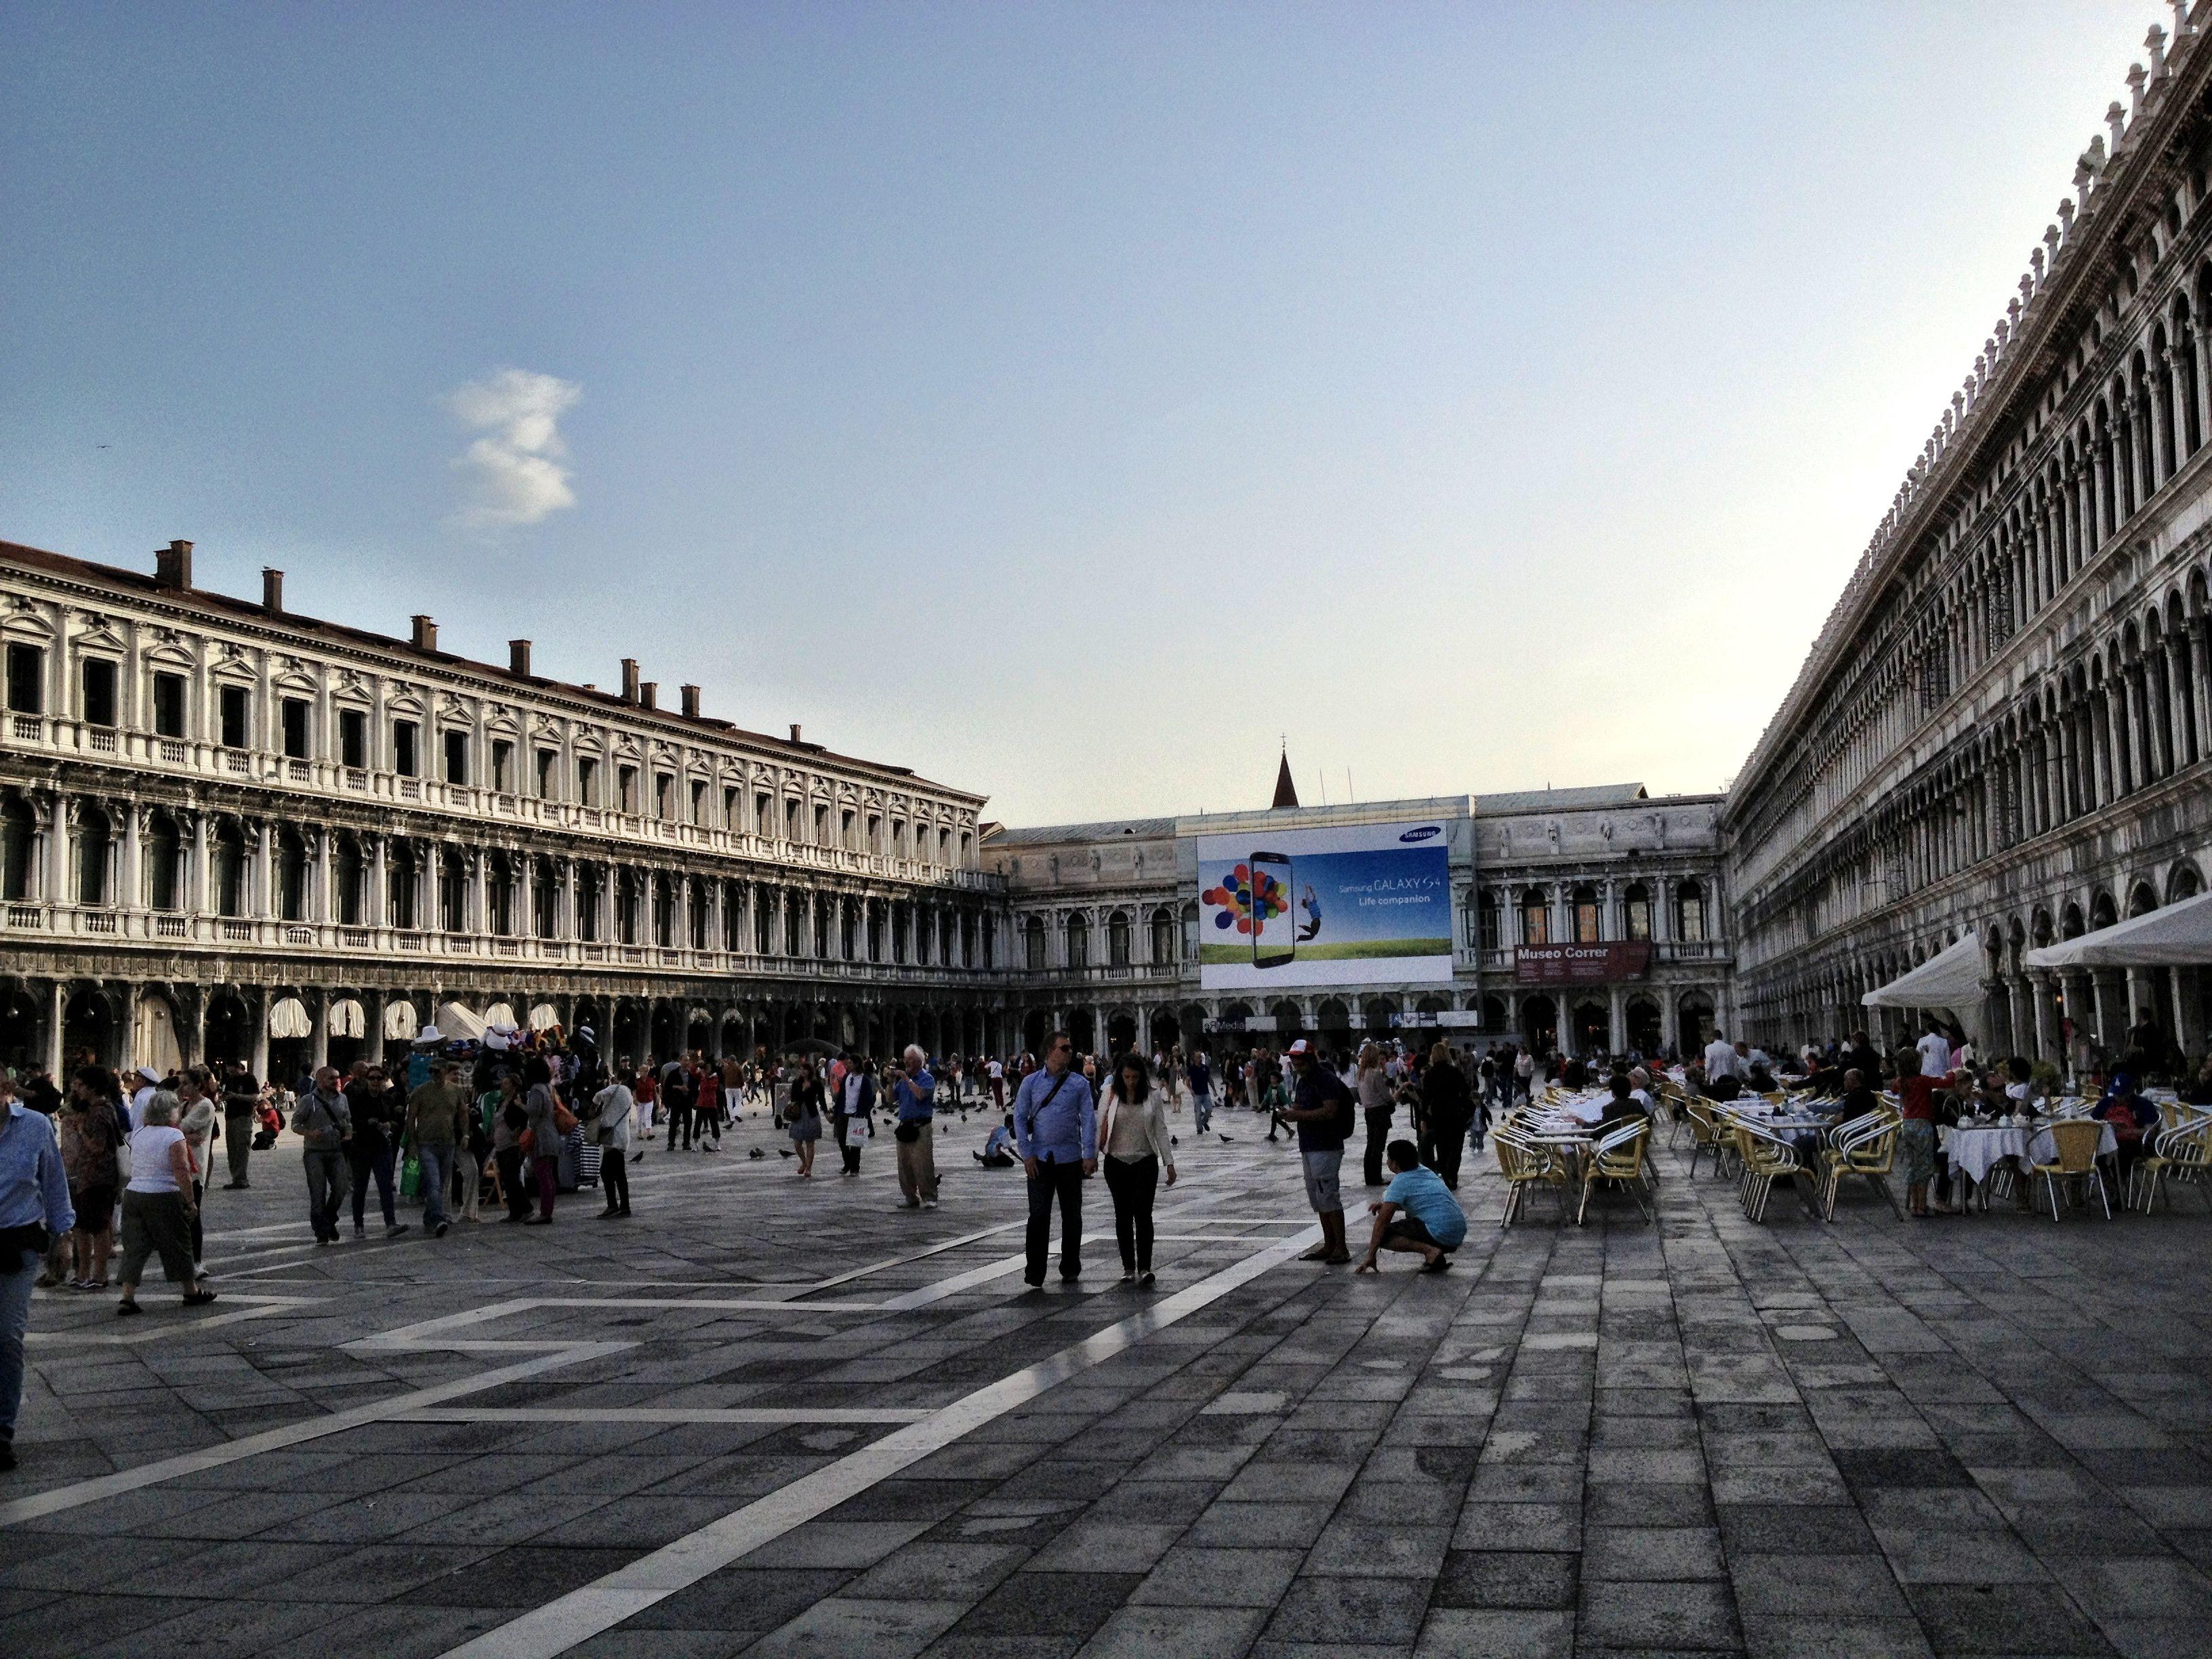 St. Mark's Square. Venice. May 2013